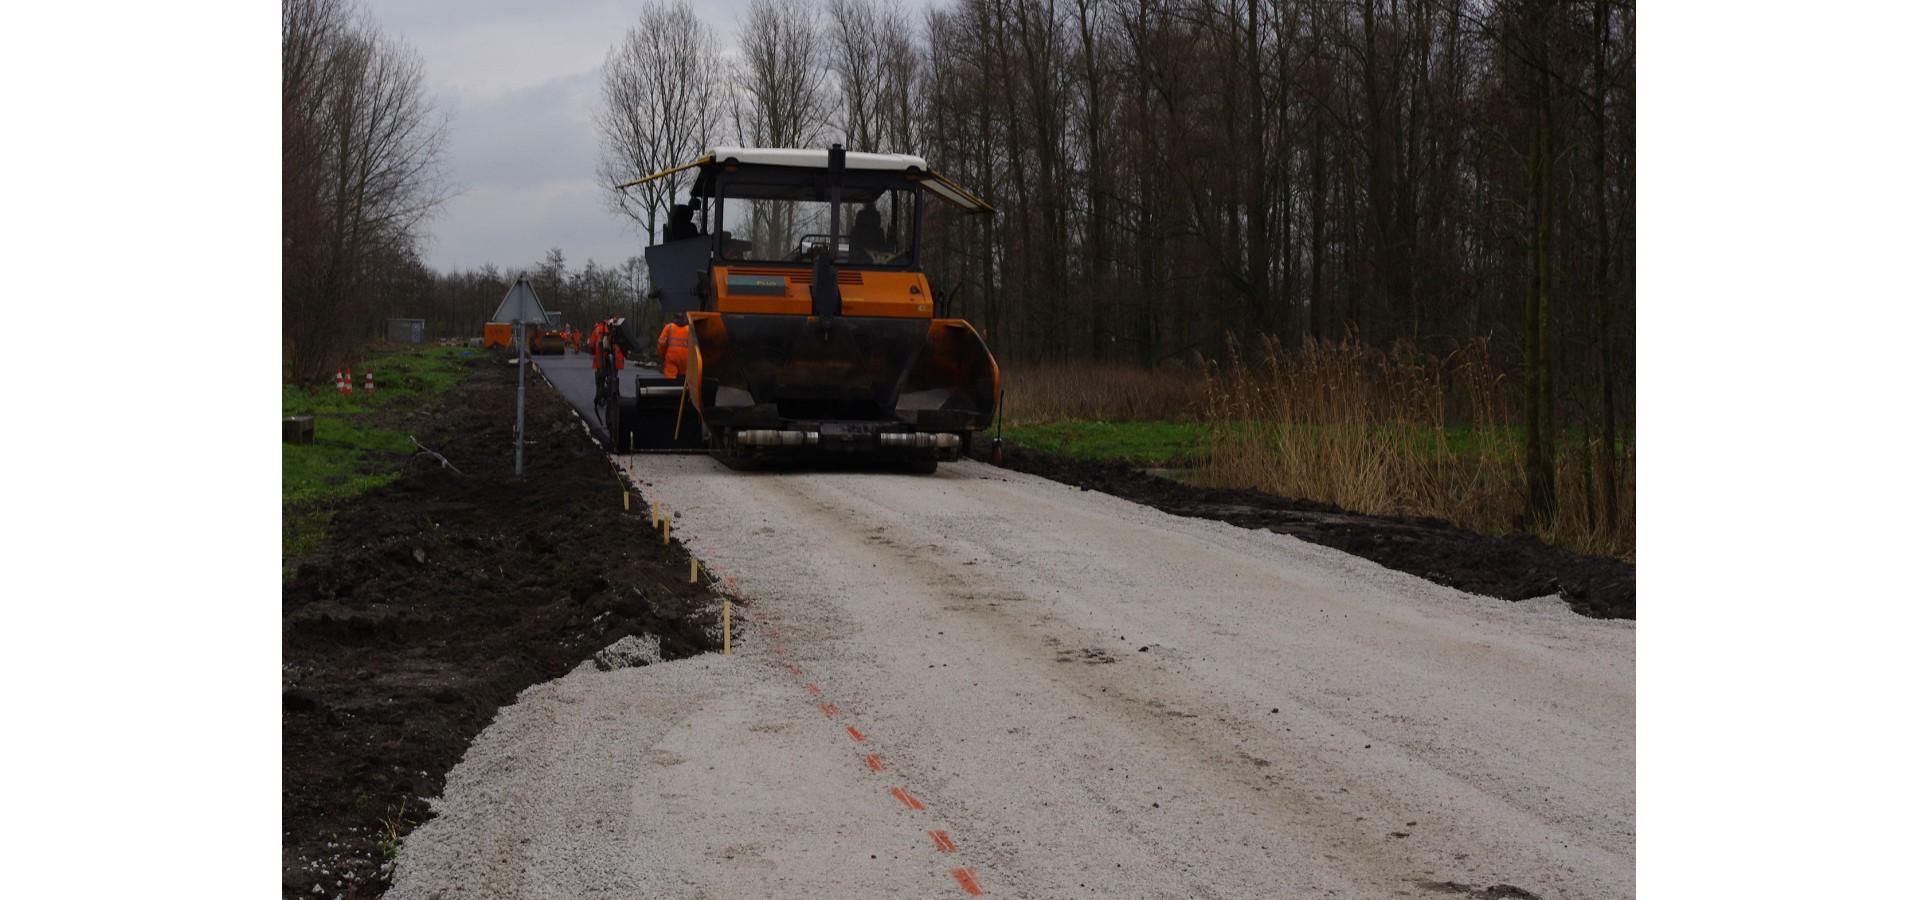 Direct-asfalt-op-Yalibims-Capelle-aan-den-IJssel.jpg